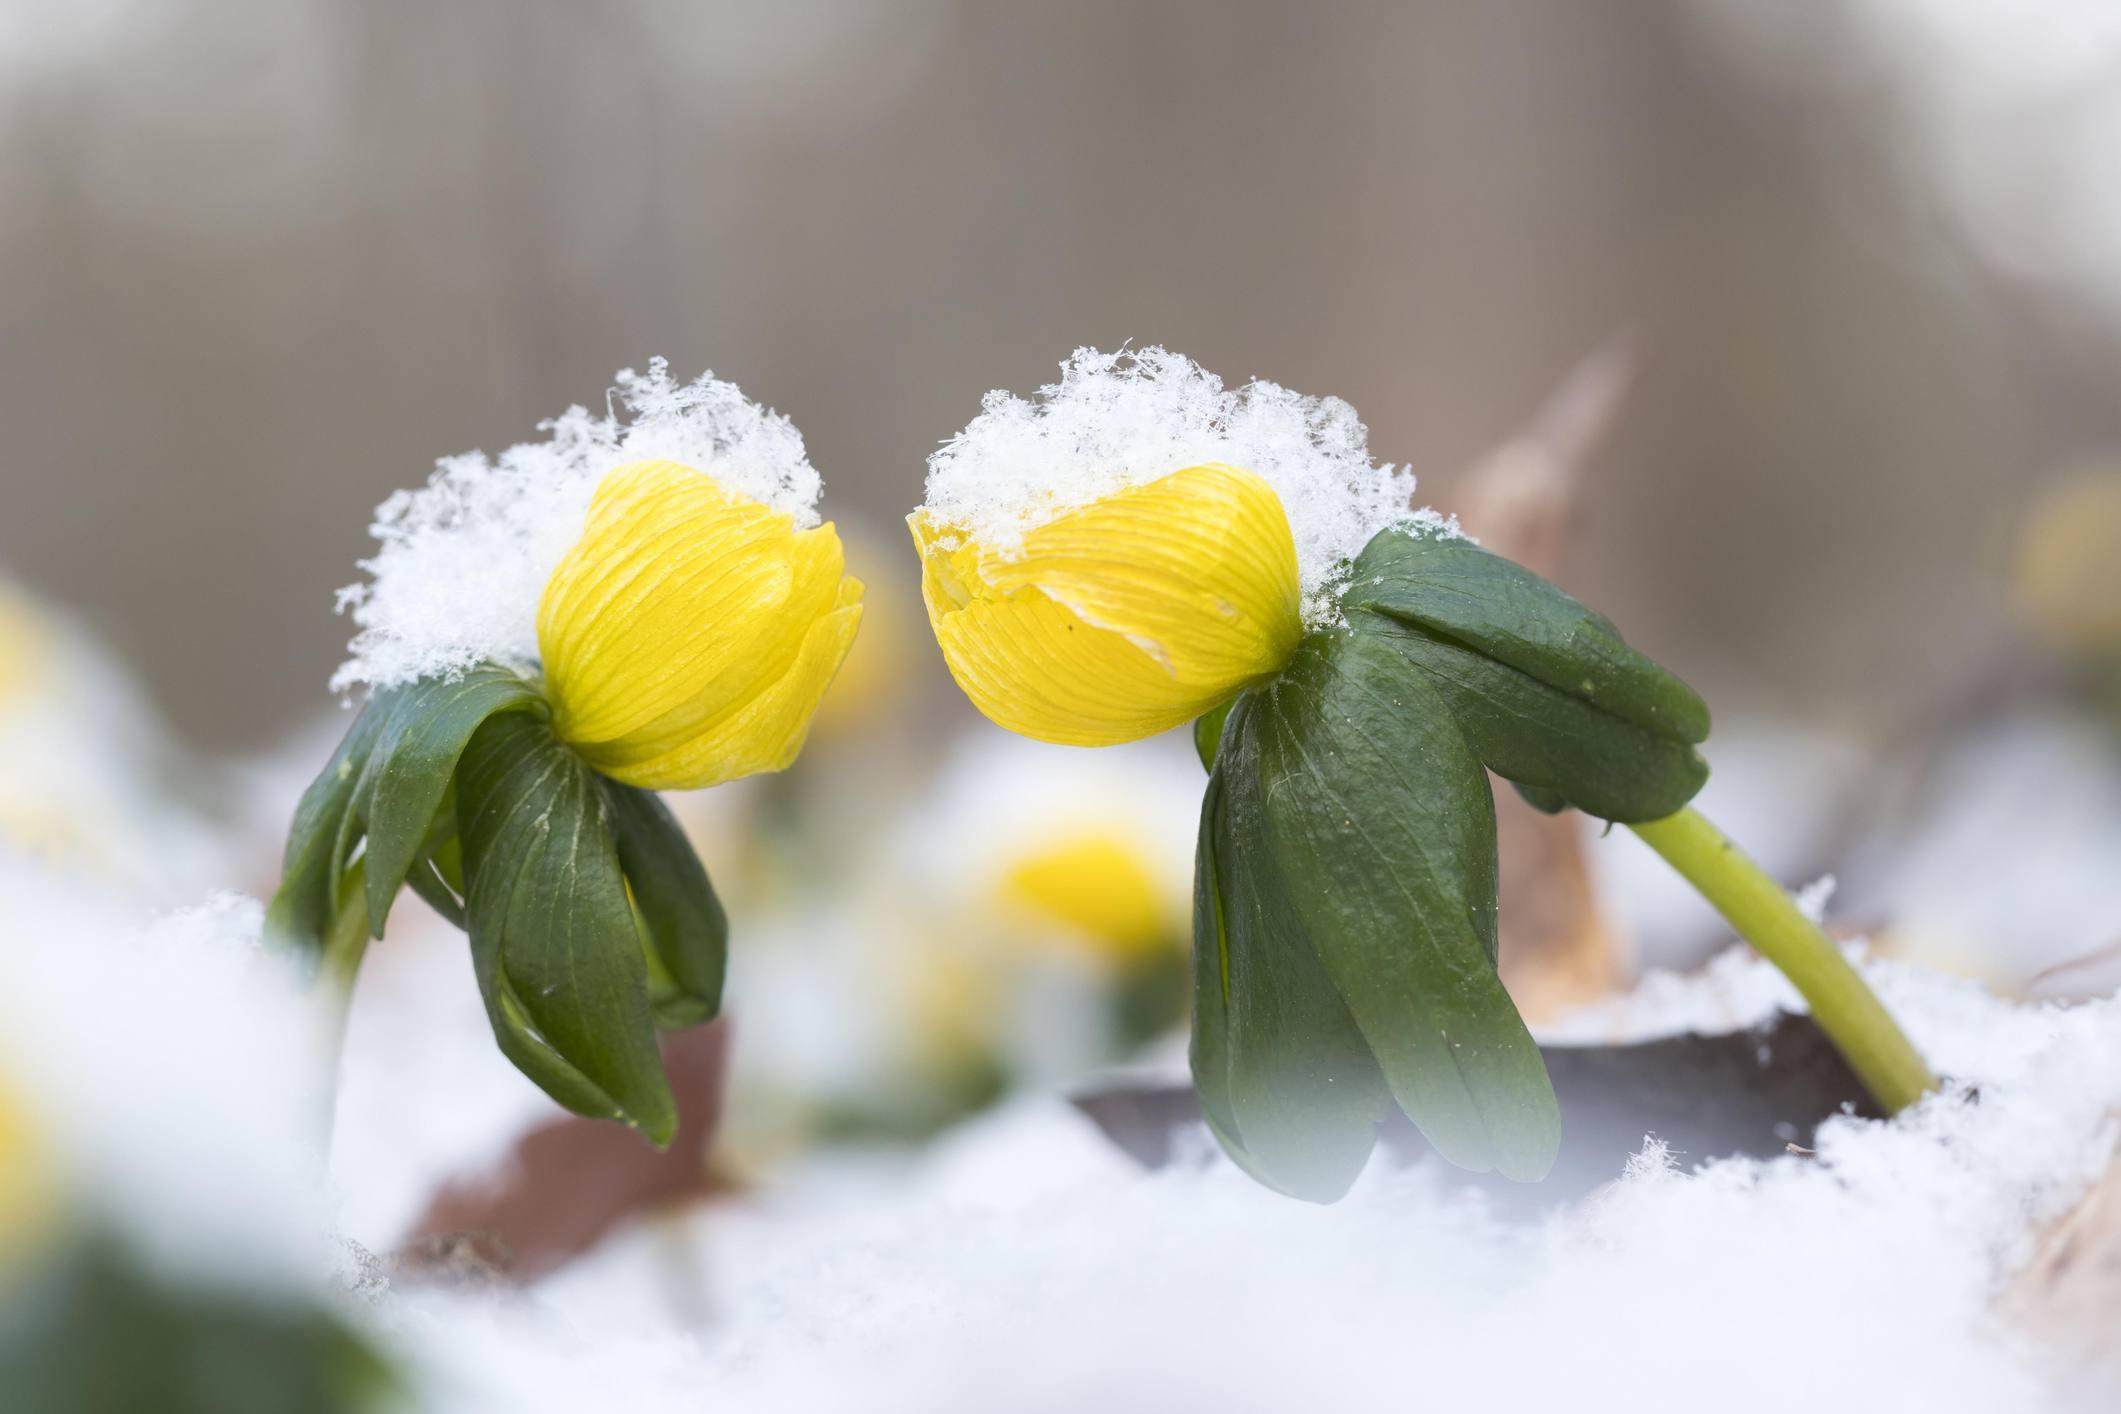 Winter aconite in bloom pushing through snow.